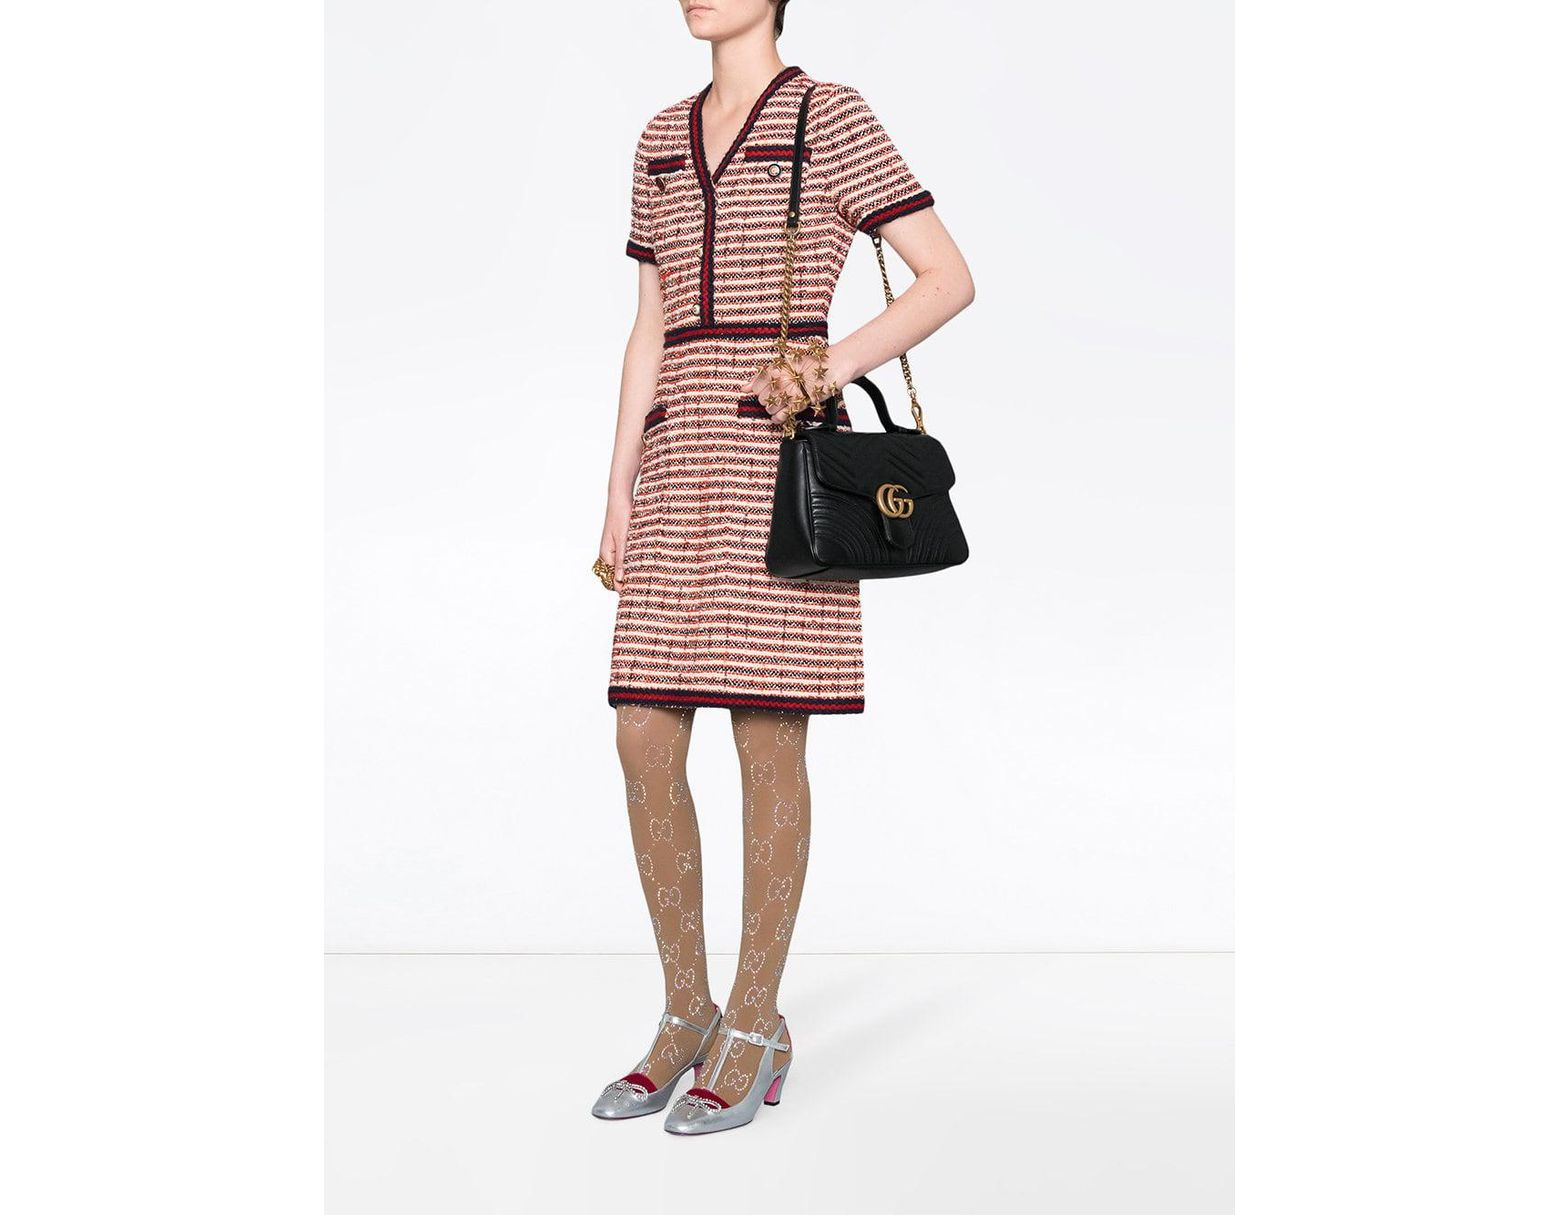 6b09cd97c05 Lyst - Gucci GG Marmont Medium Top Handle Bag in Black - Save 26%